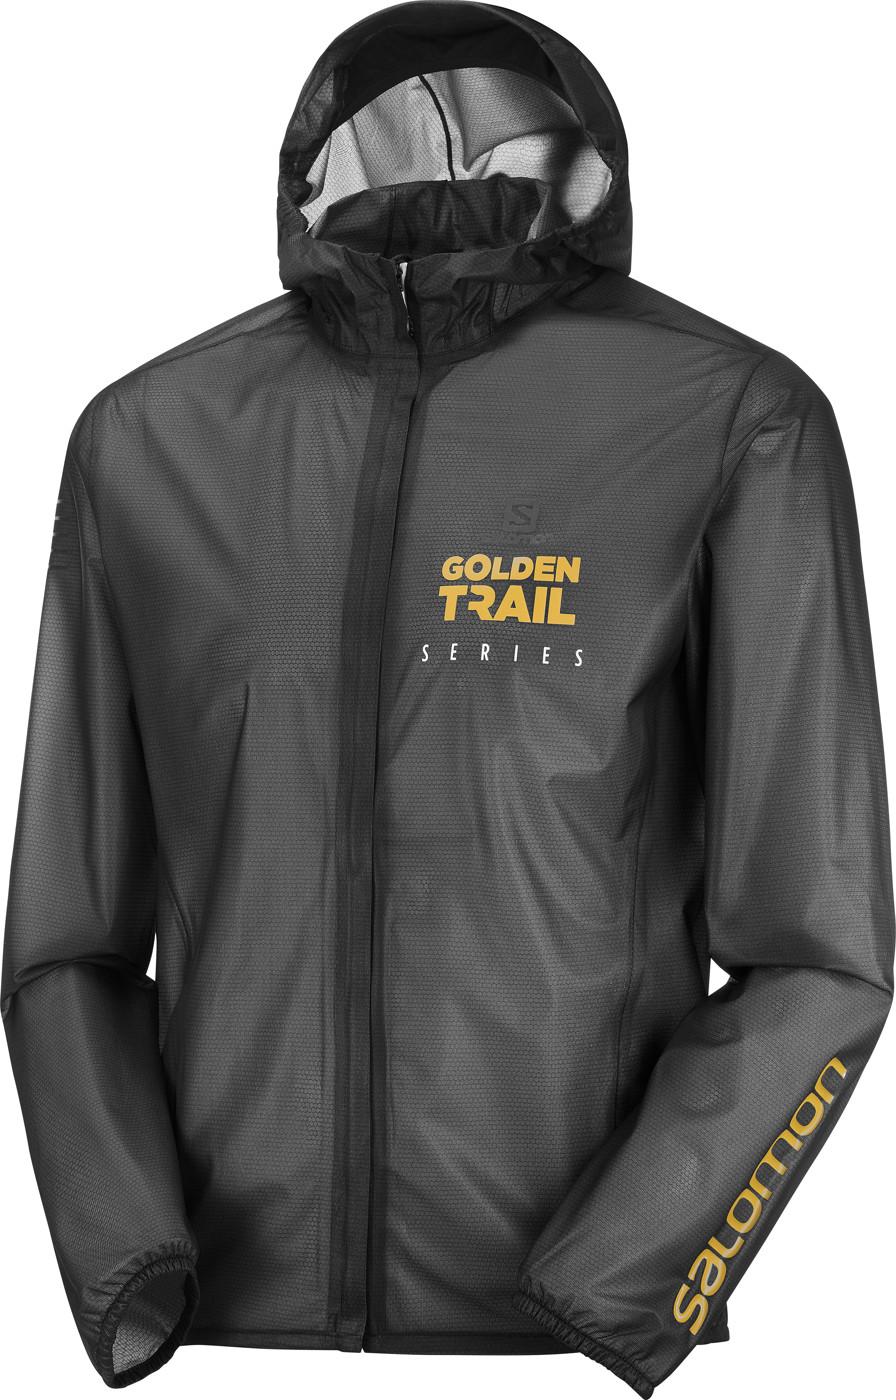 SALOMON BONATTI RACE WP JKT M-Golden Trail Serie M - Herren